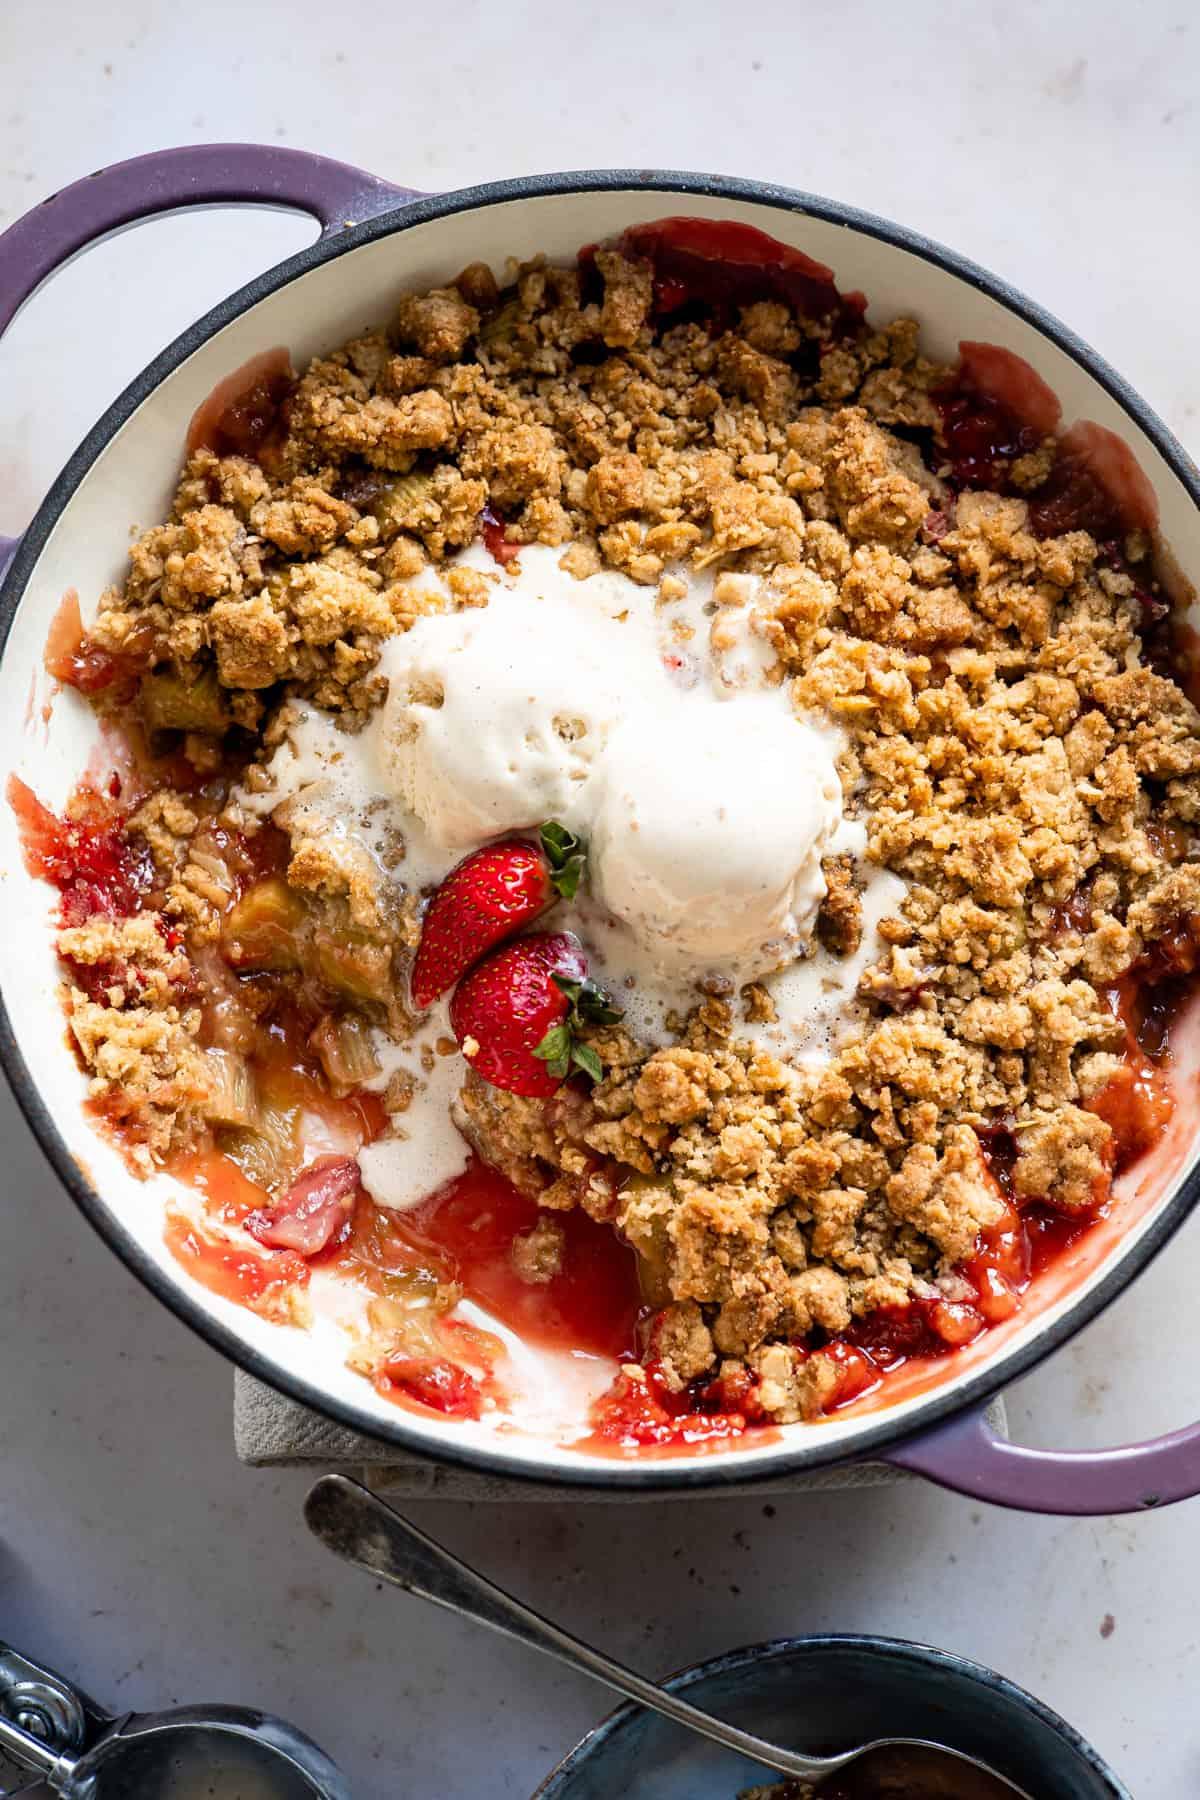 Strawberry rhubarb fruit crumble with vanilla ice cream- Aldi recipes